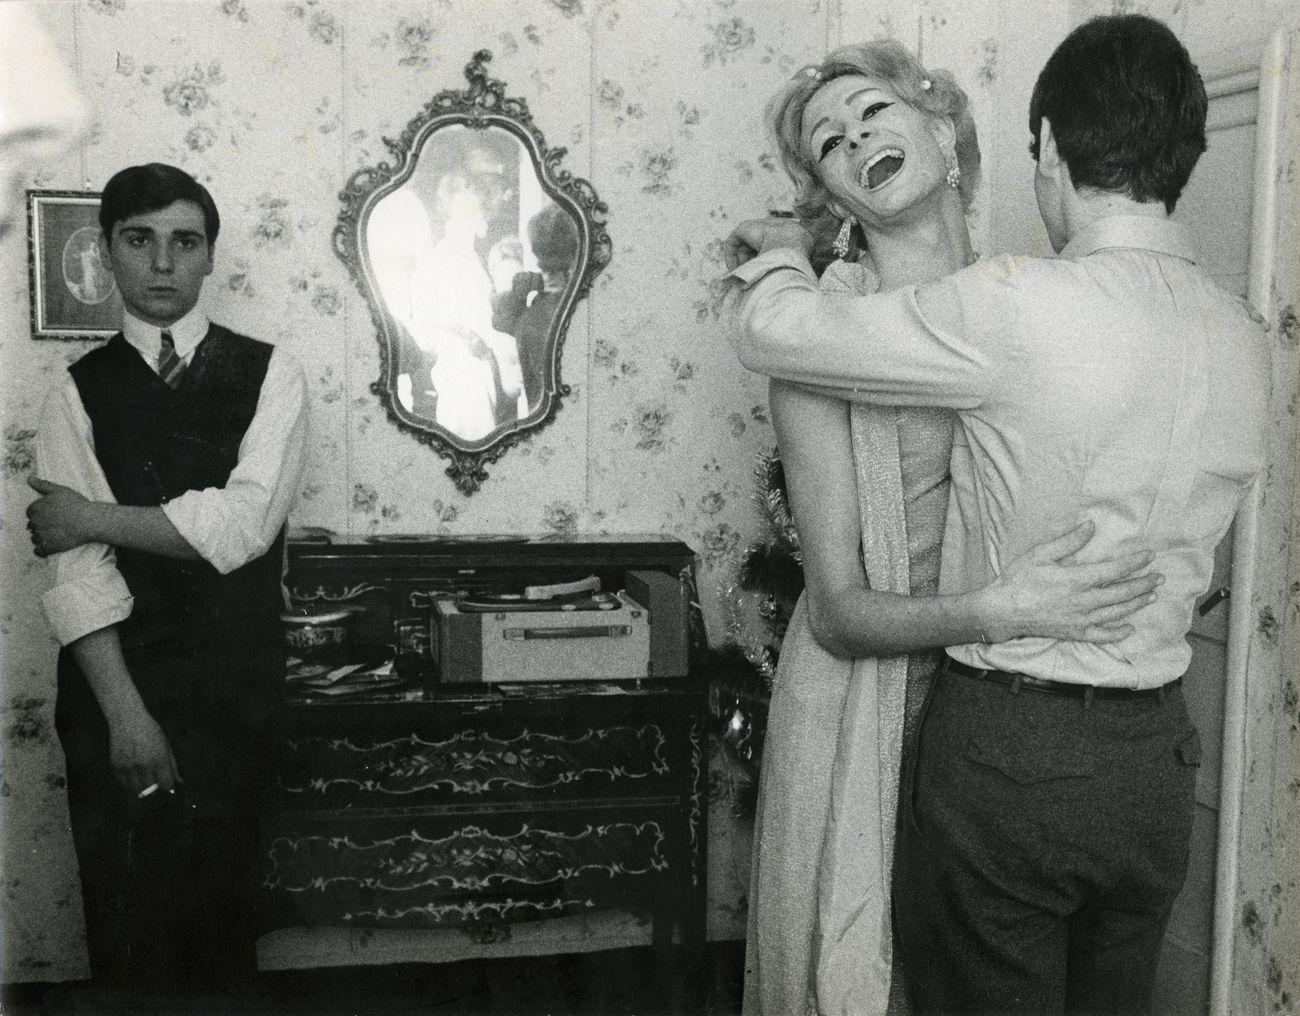 Lisetta Carmi, I Travestiti, 1965 © Lisetta Carmi. Courtesy Galleria Martini & Ronchetti